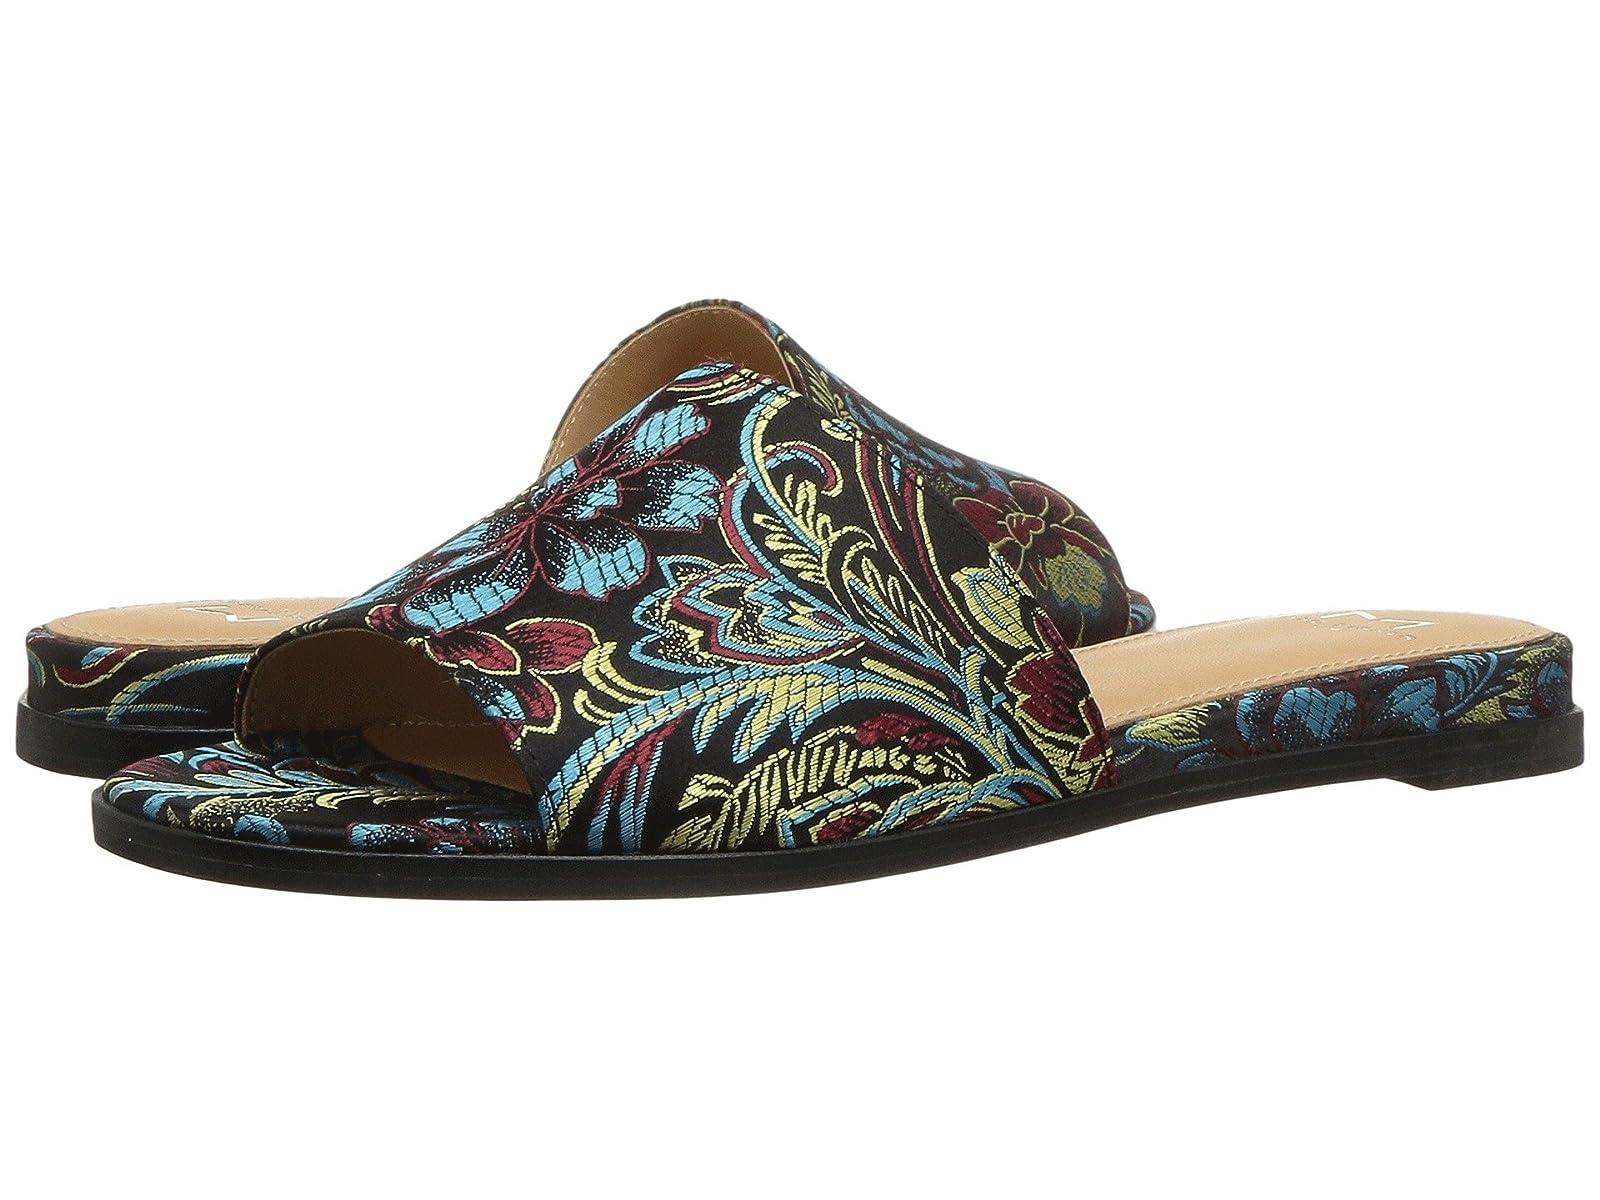 Marc Fisher LTD Wyndi 2Cheap and distinctive eye-catching shoes